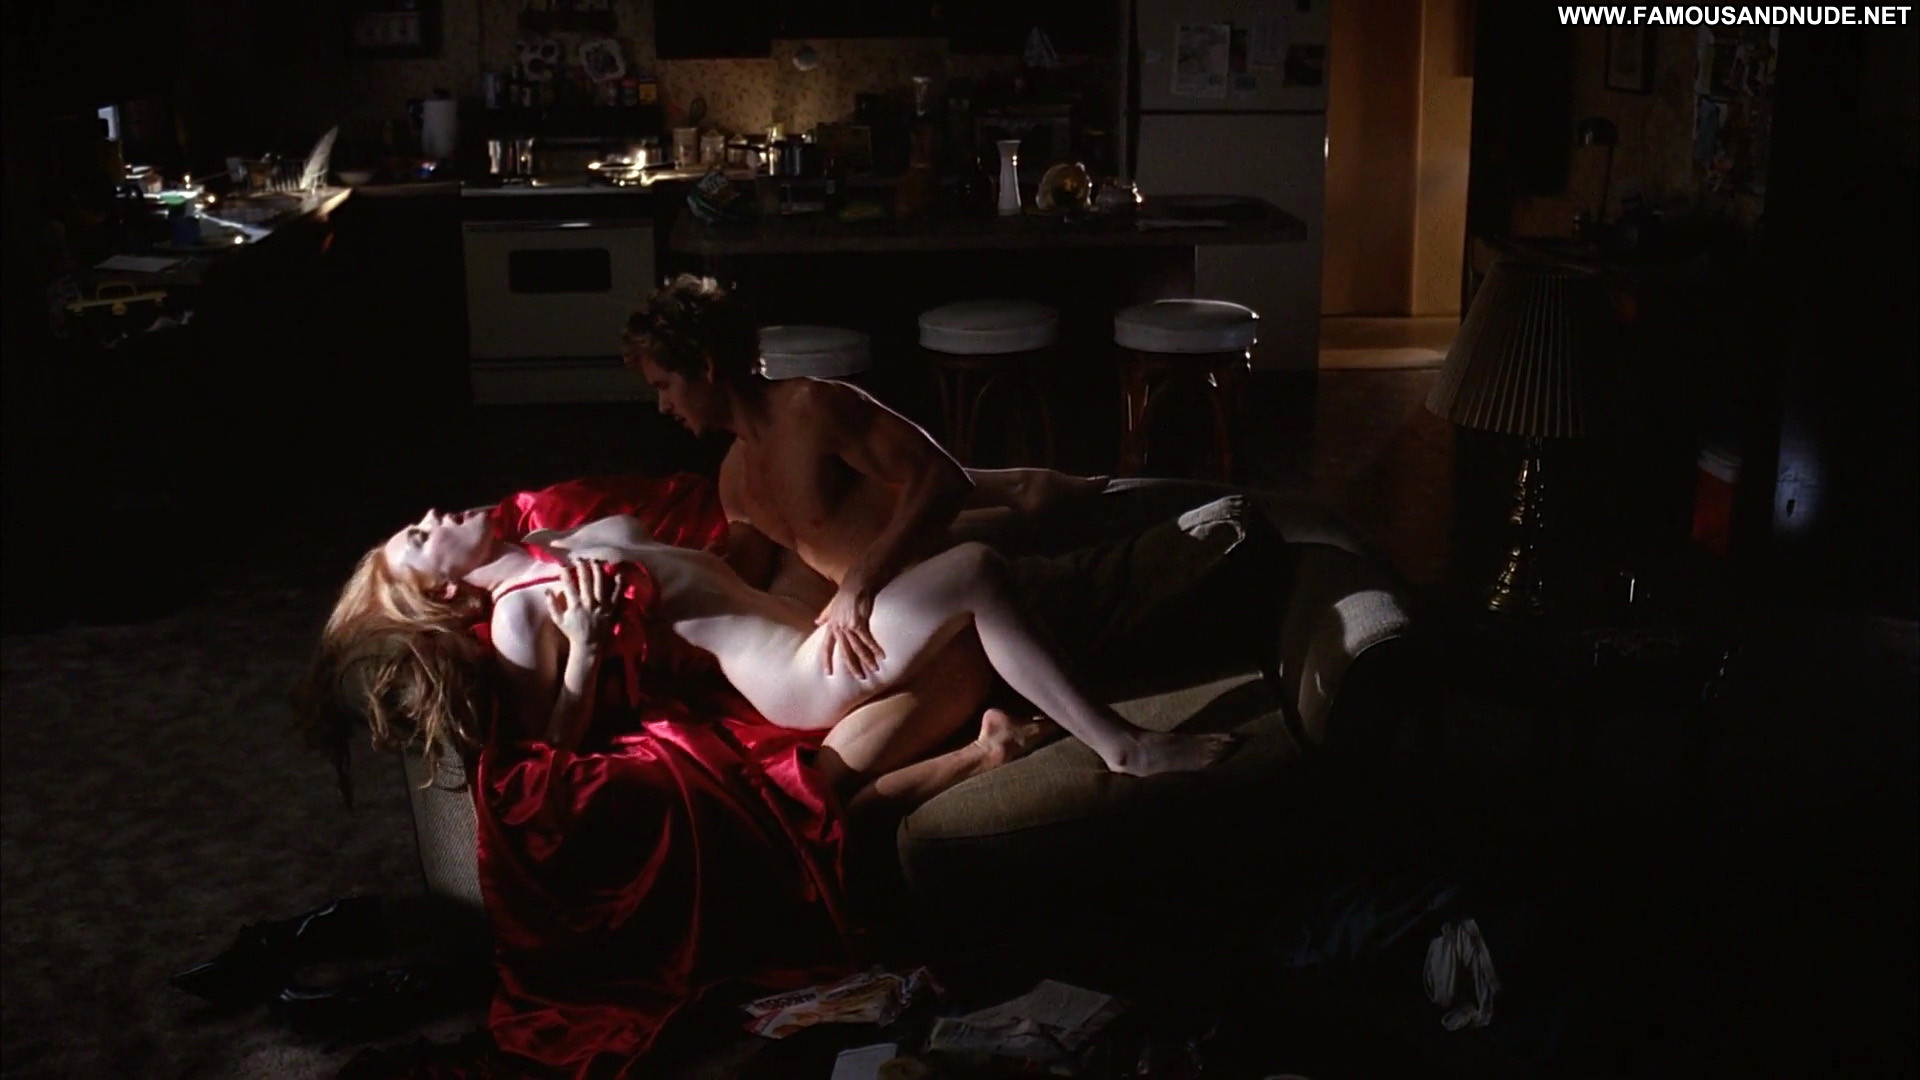 Anna Paquin Nude Leaks All Sex Scenes